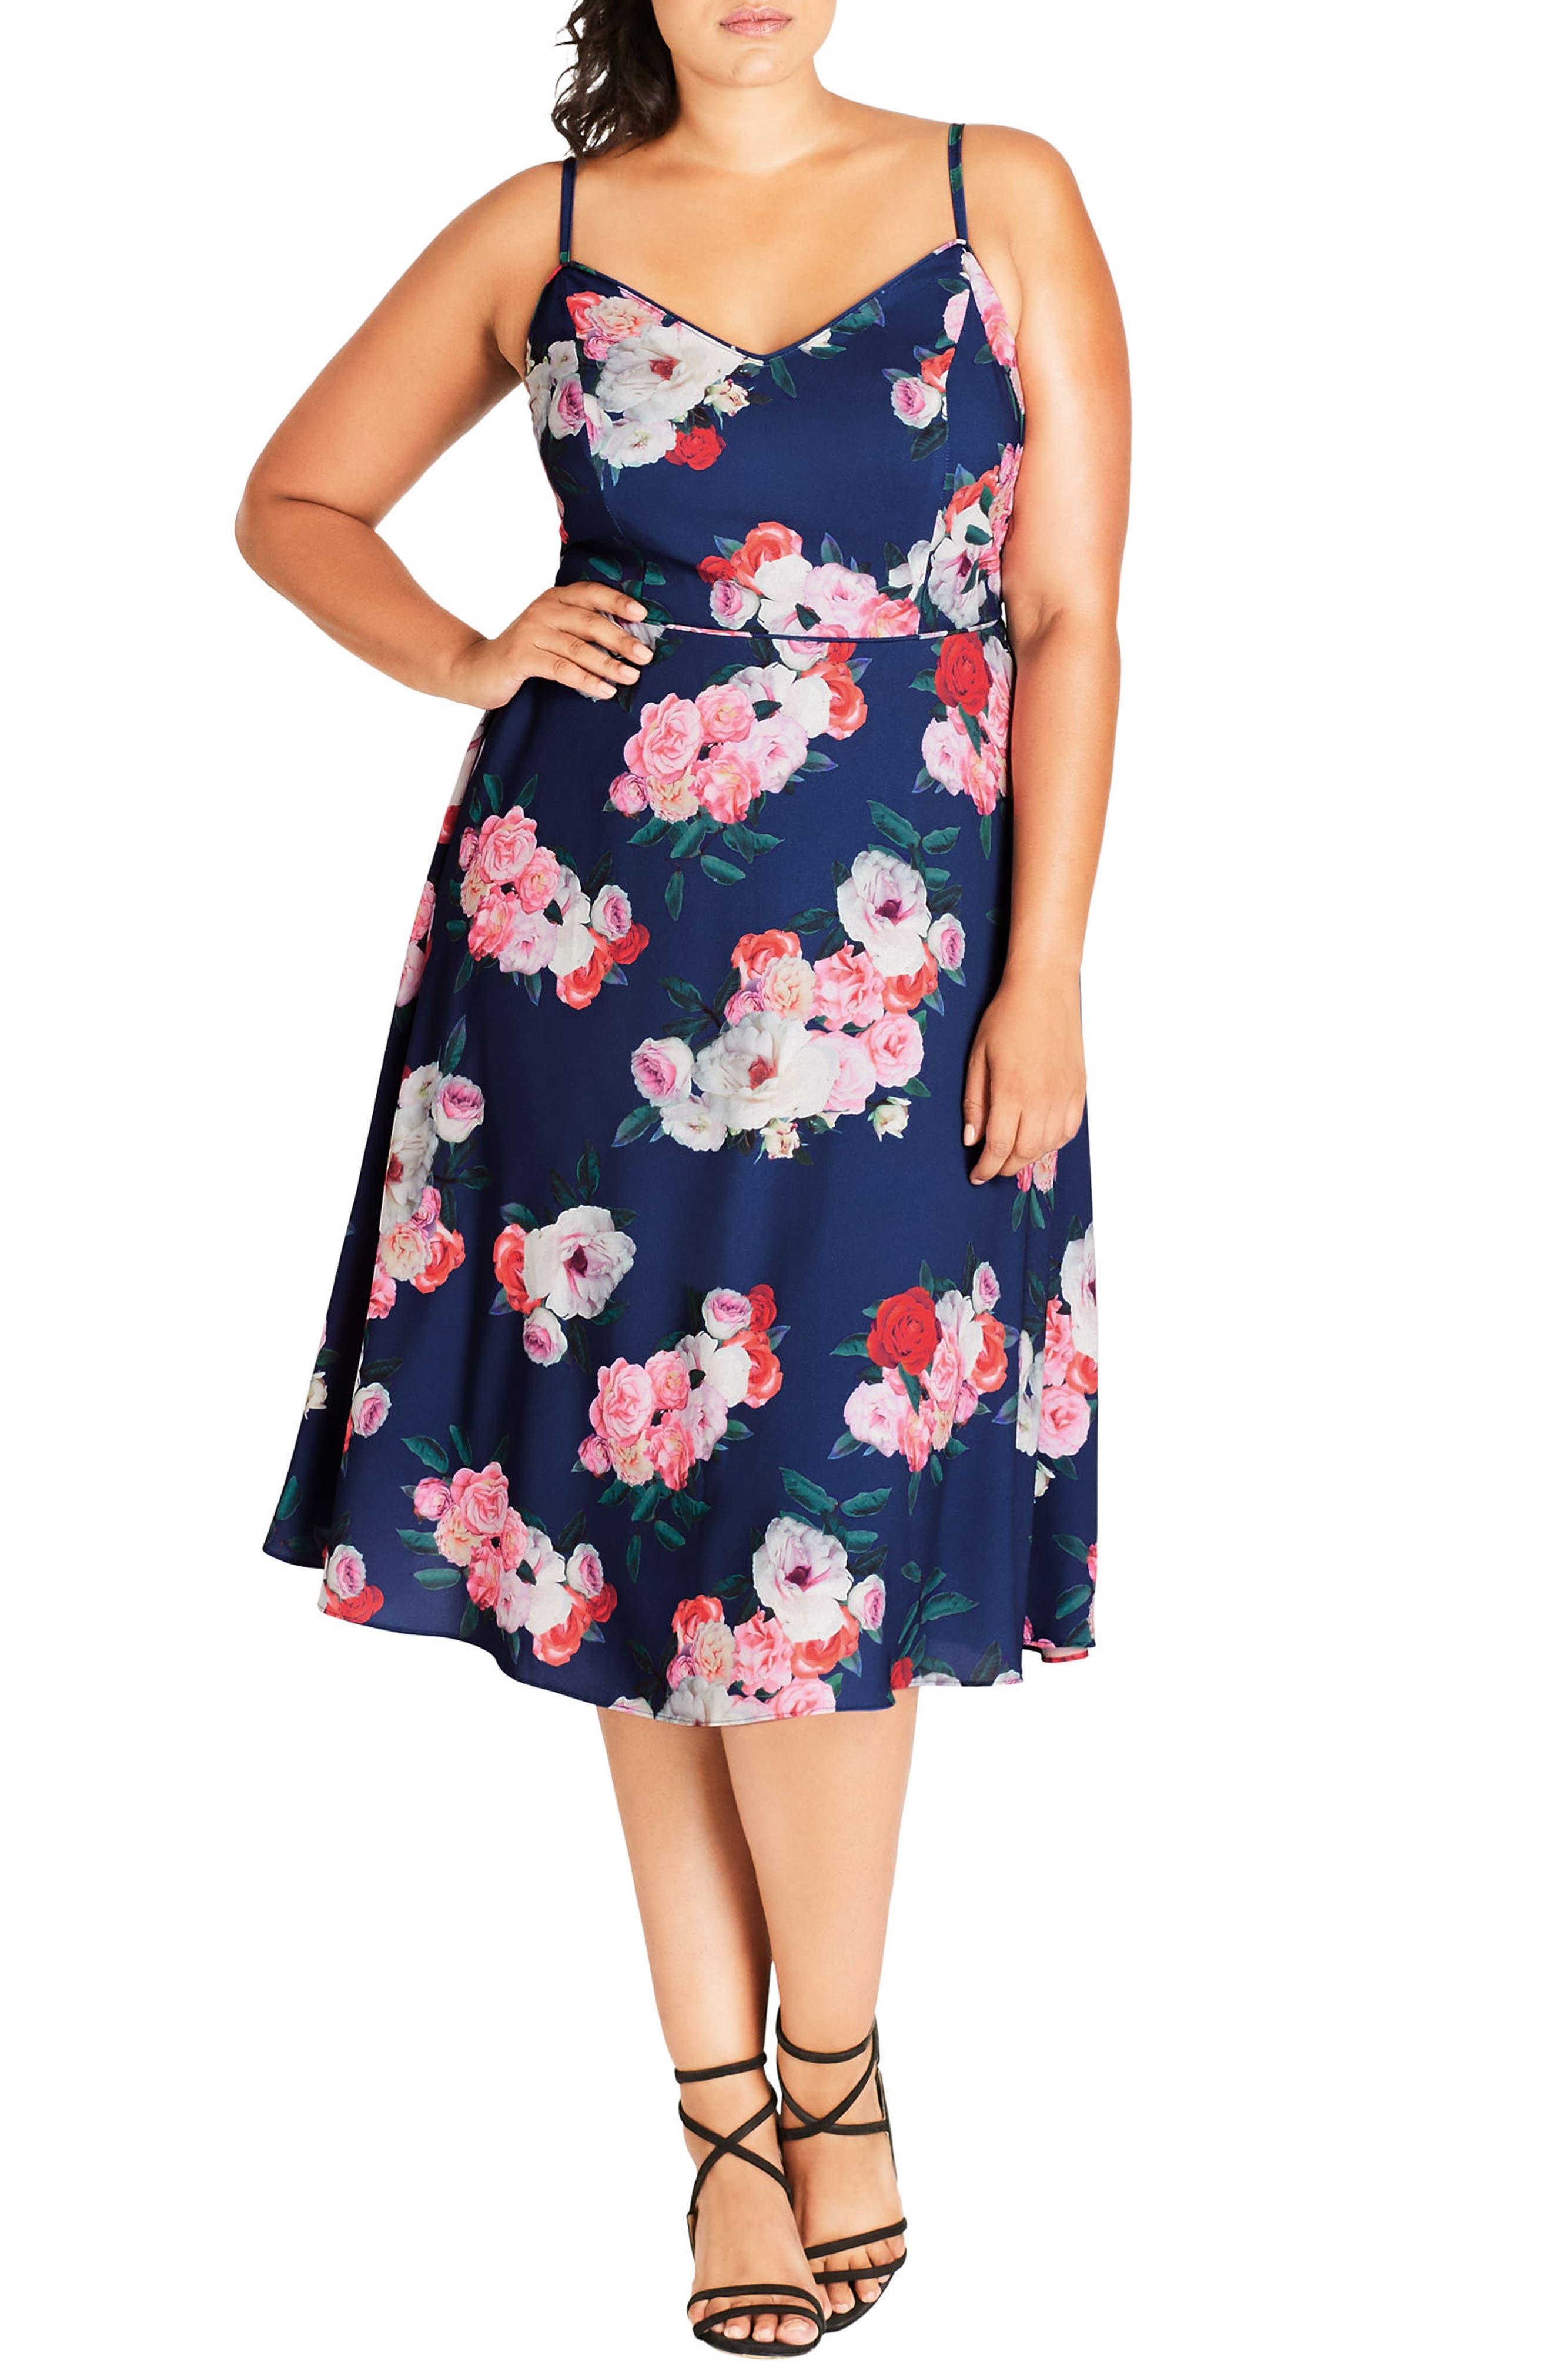 Summer Fling Floral Print Midi Dress,                             Main thumbnail 1, color,                             400